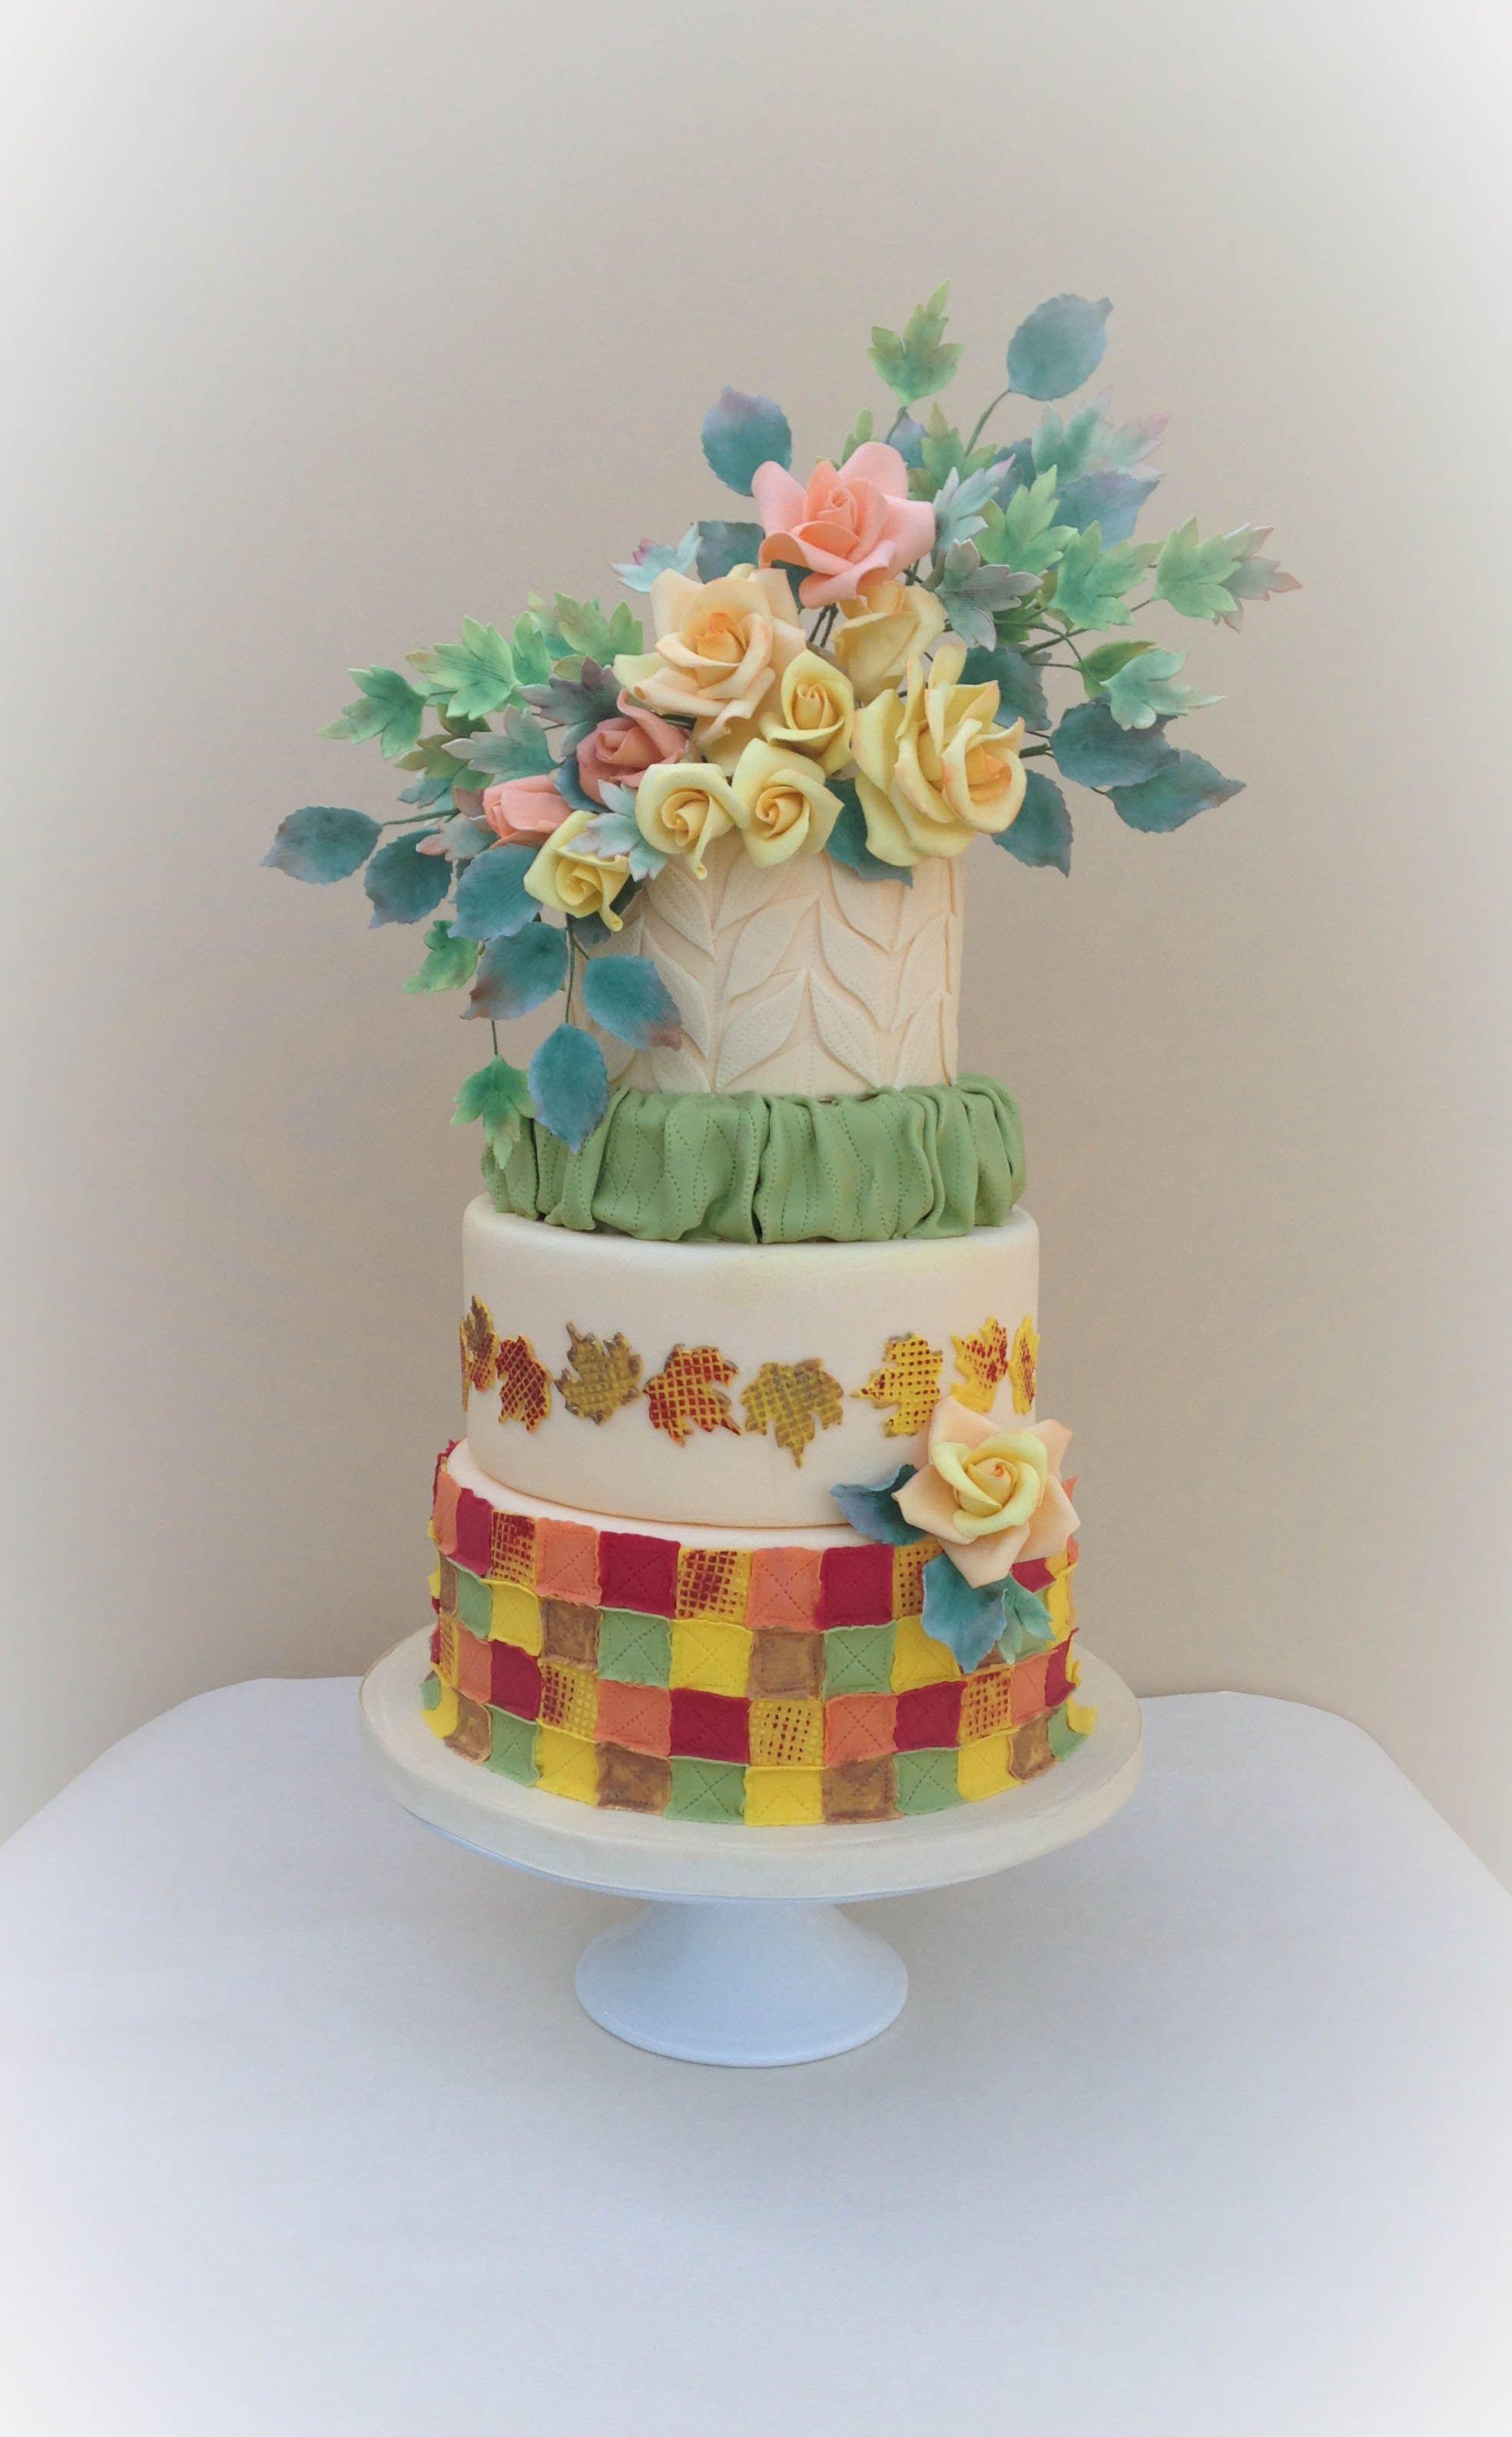 Autumn quilt cake featured in Cake Central magazine!